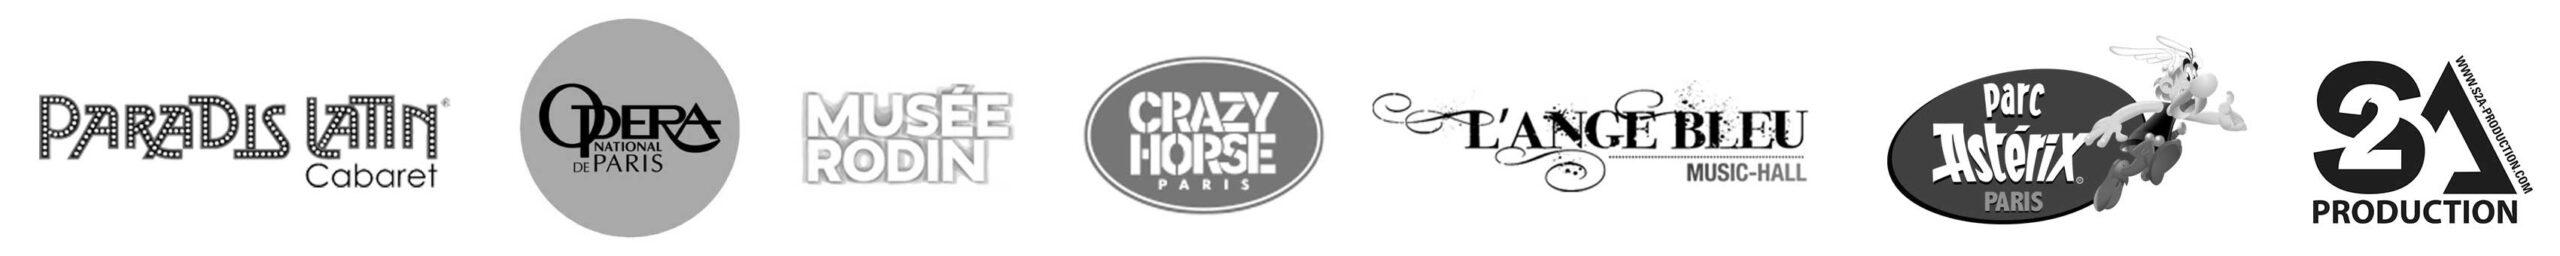 Logo-references-elodie-lobjois